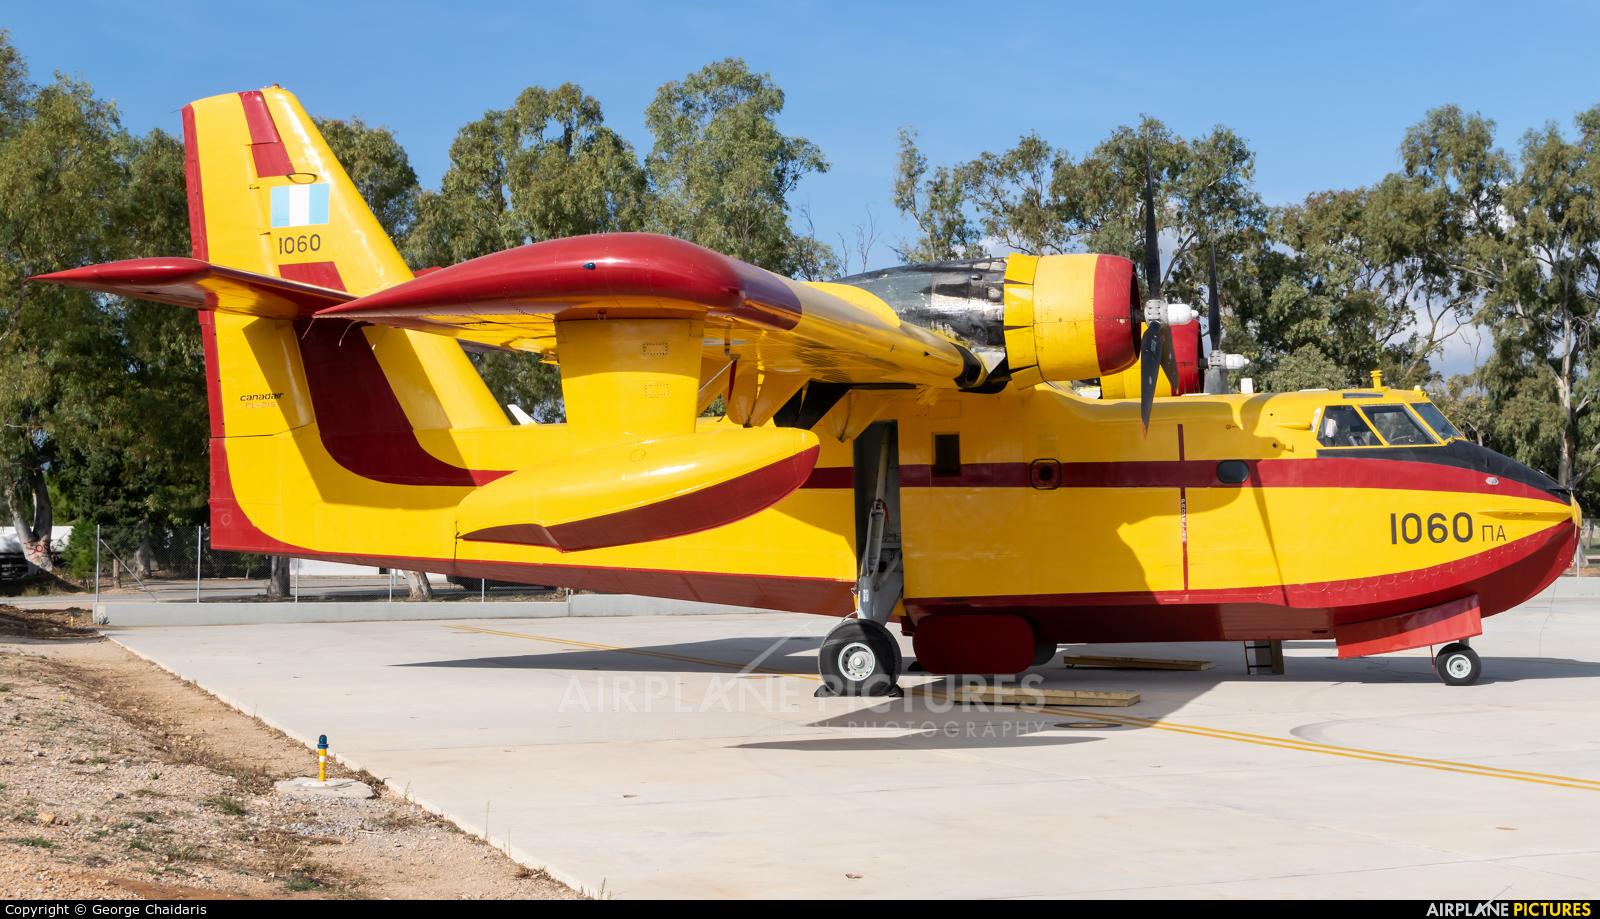 Greece - Hellenic Air Force 1060 aircraft at Elefsina